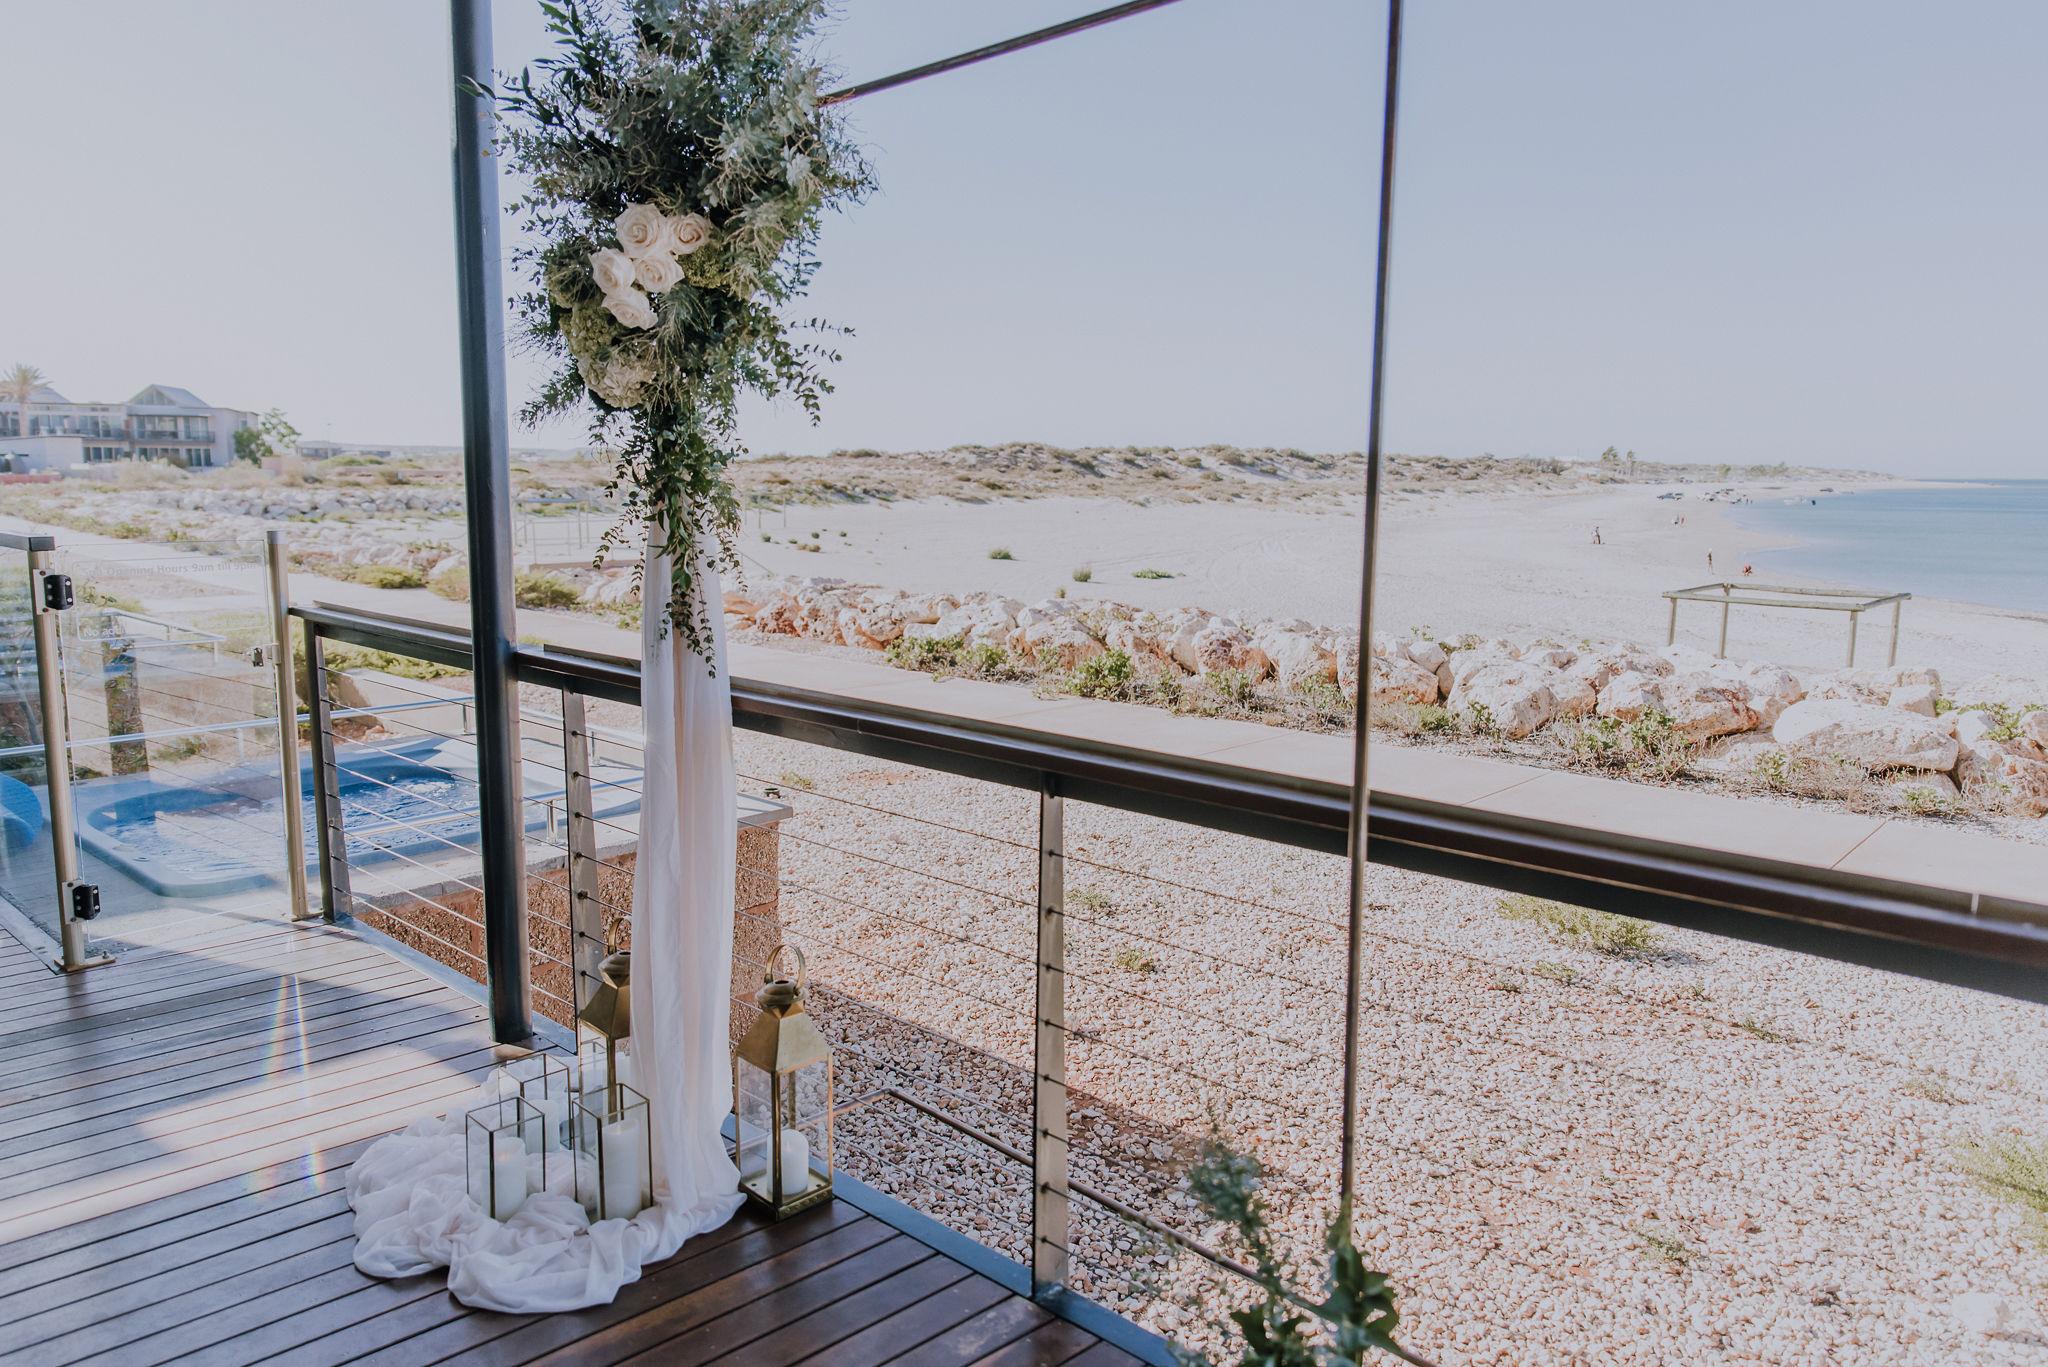 saltandsandeventhire-wedding-stylist-exmouth-ningaloo-wa-R&O-Elopement-Renaeharveyphotograpy-10.jpg